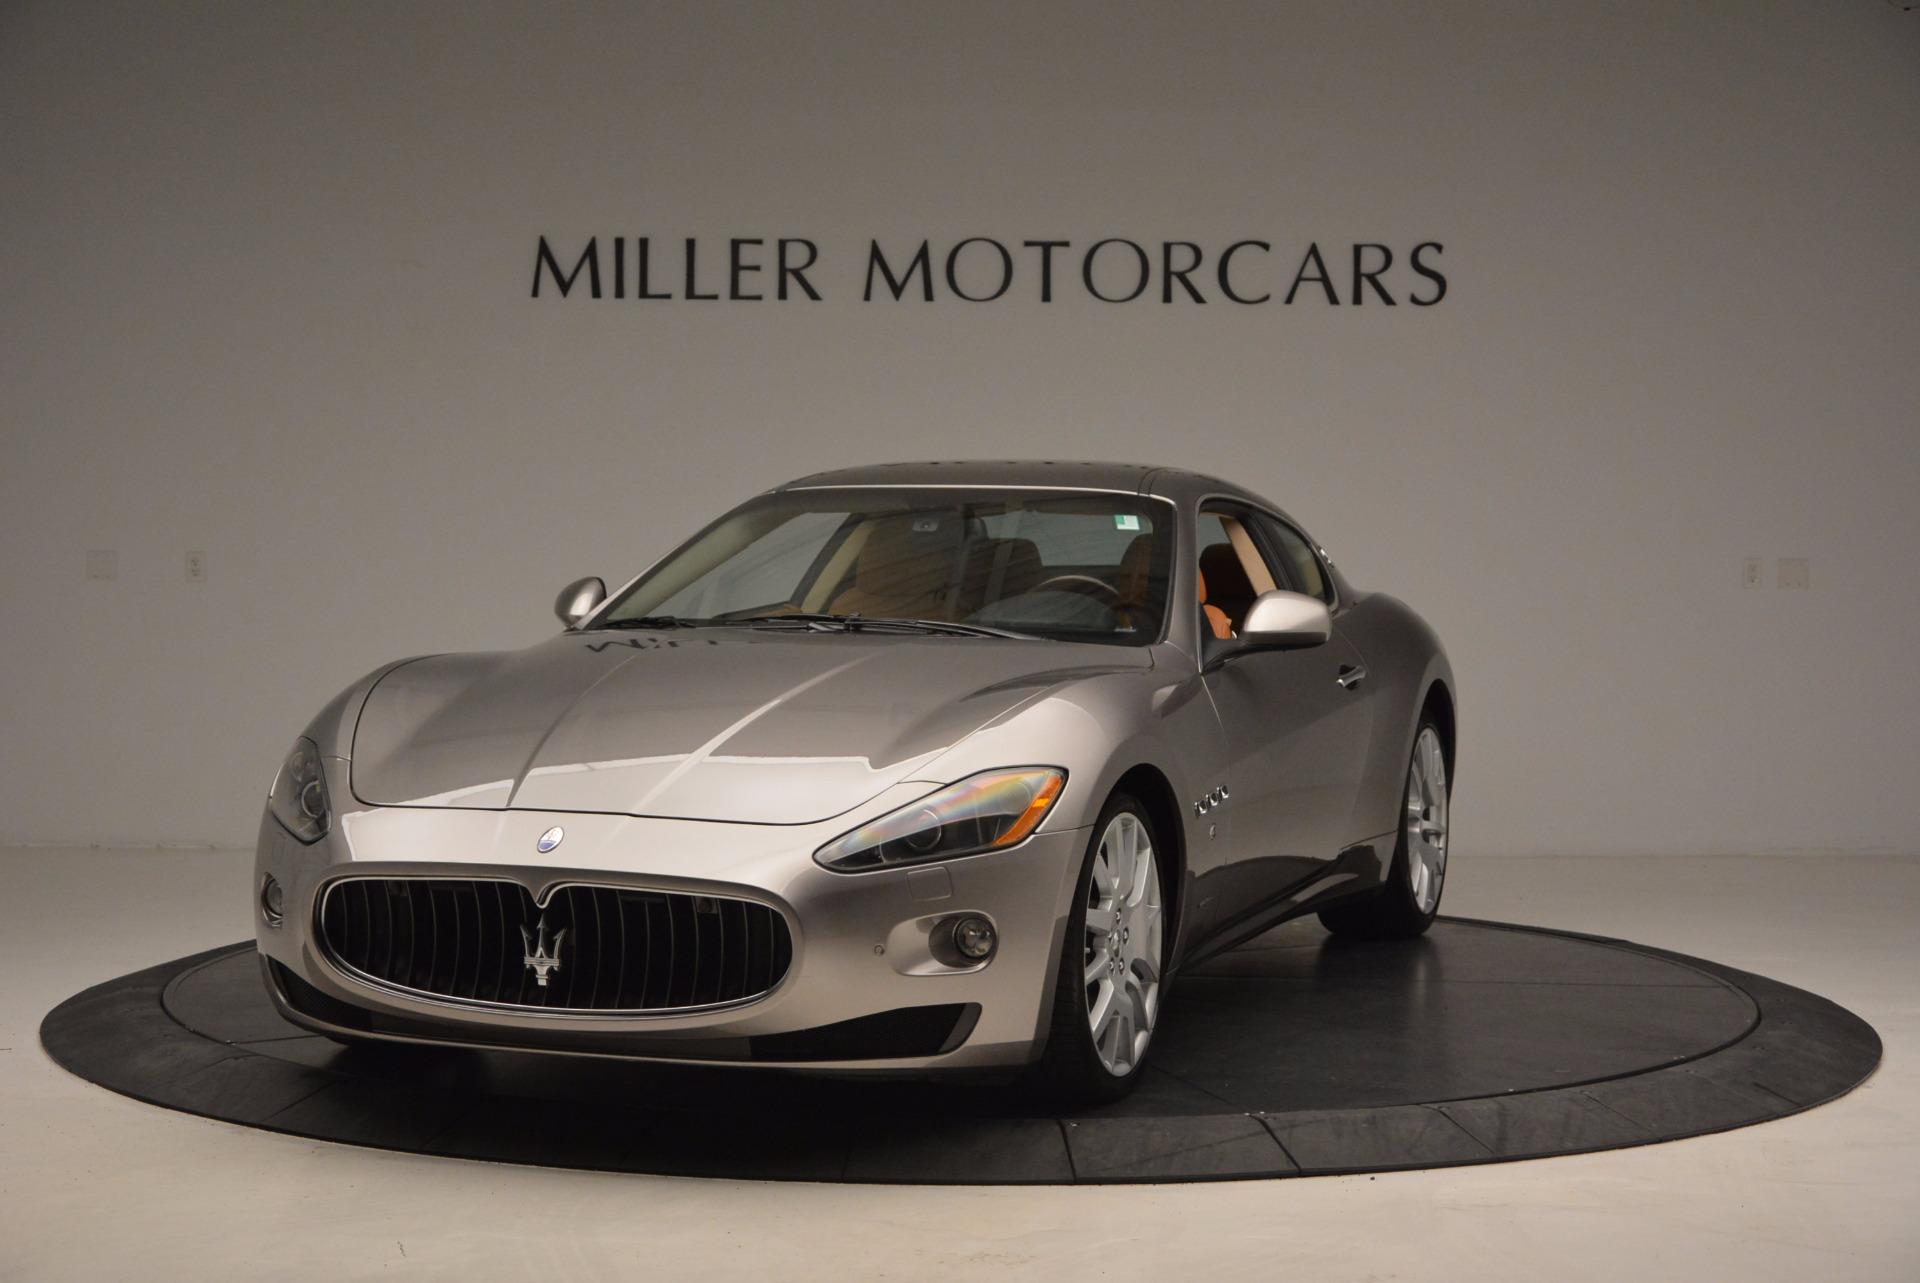 Used 2009 Maserati GranTurismo S for sale Sold at McLaren Greenwich in Greenwich CT 06830 1